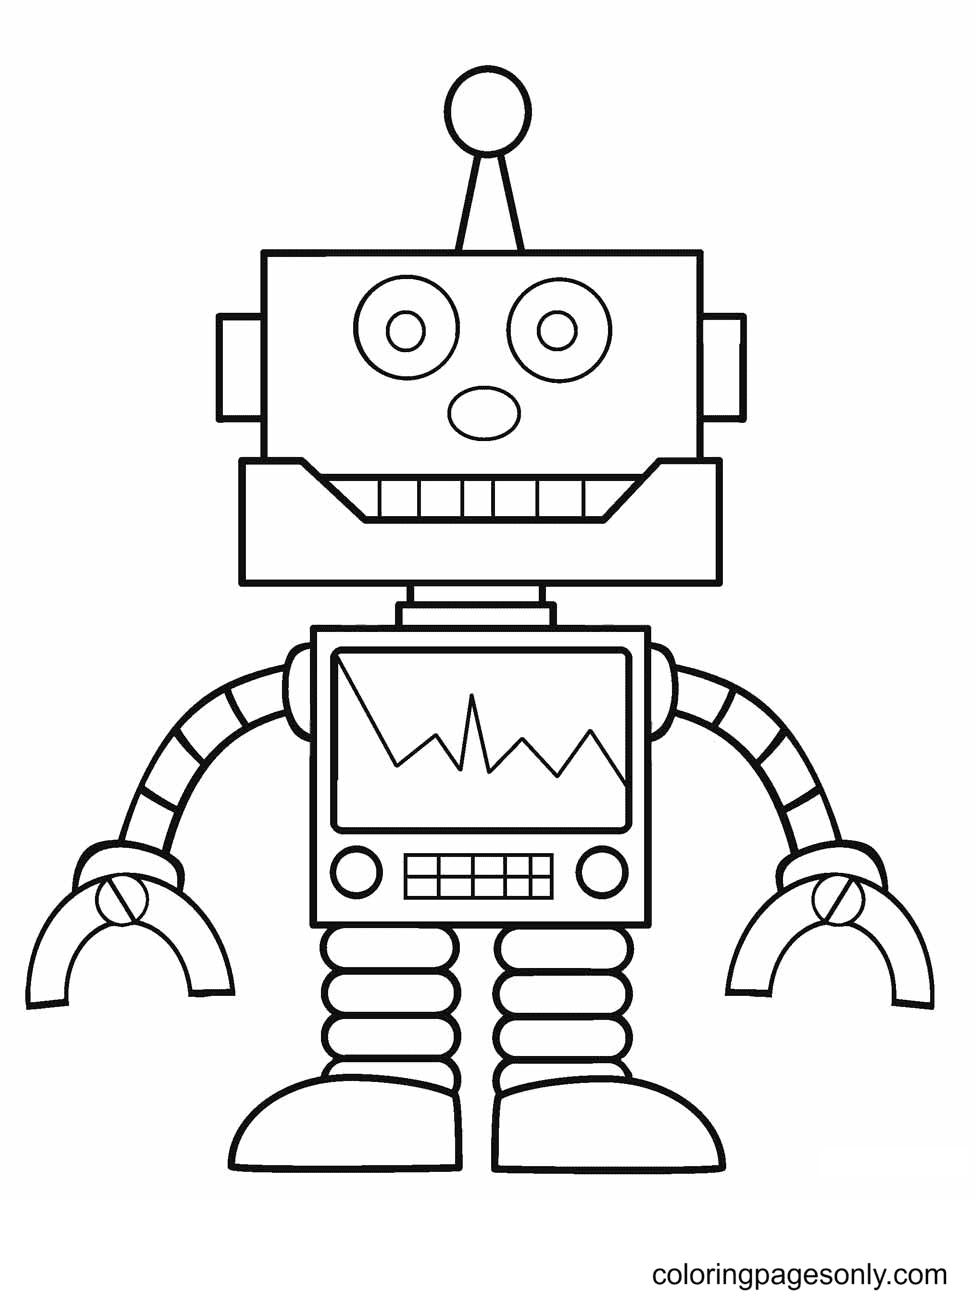 Robot Preschoolers Coloring Page